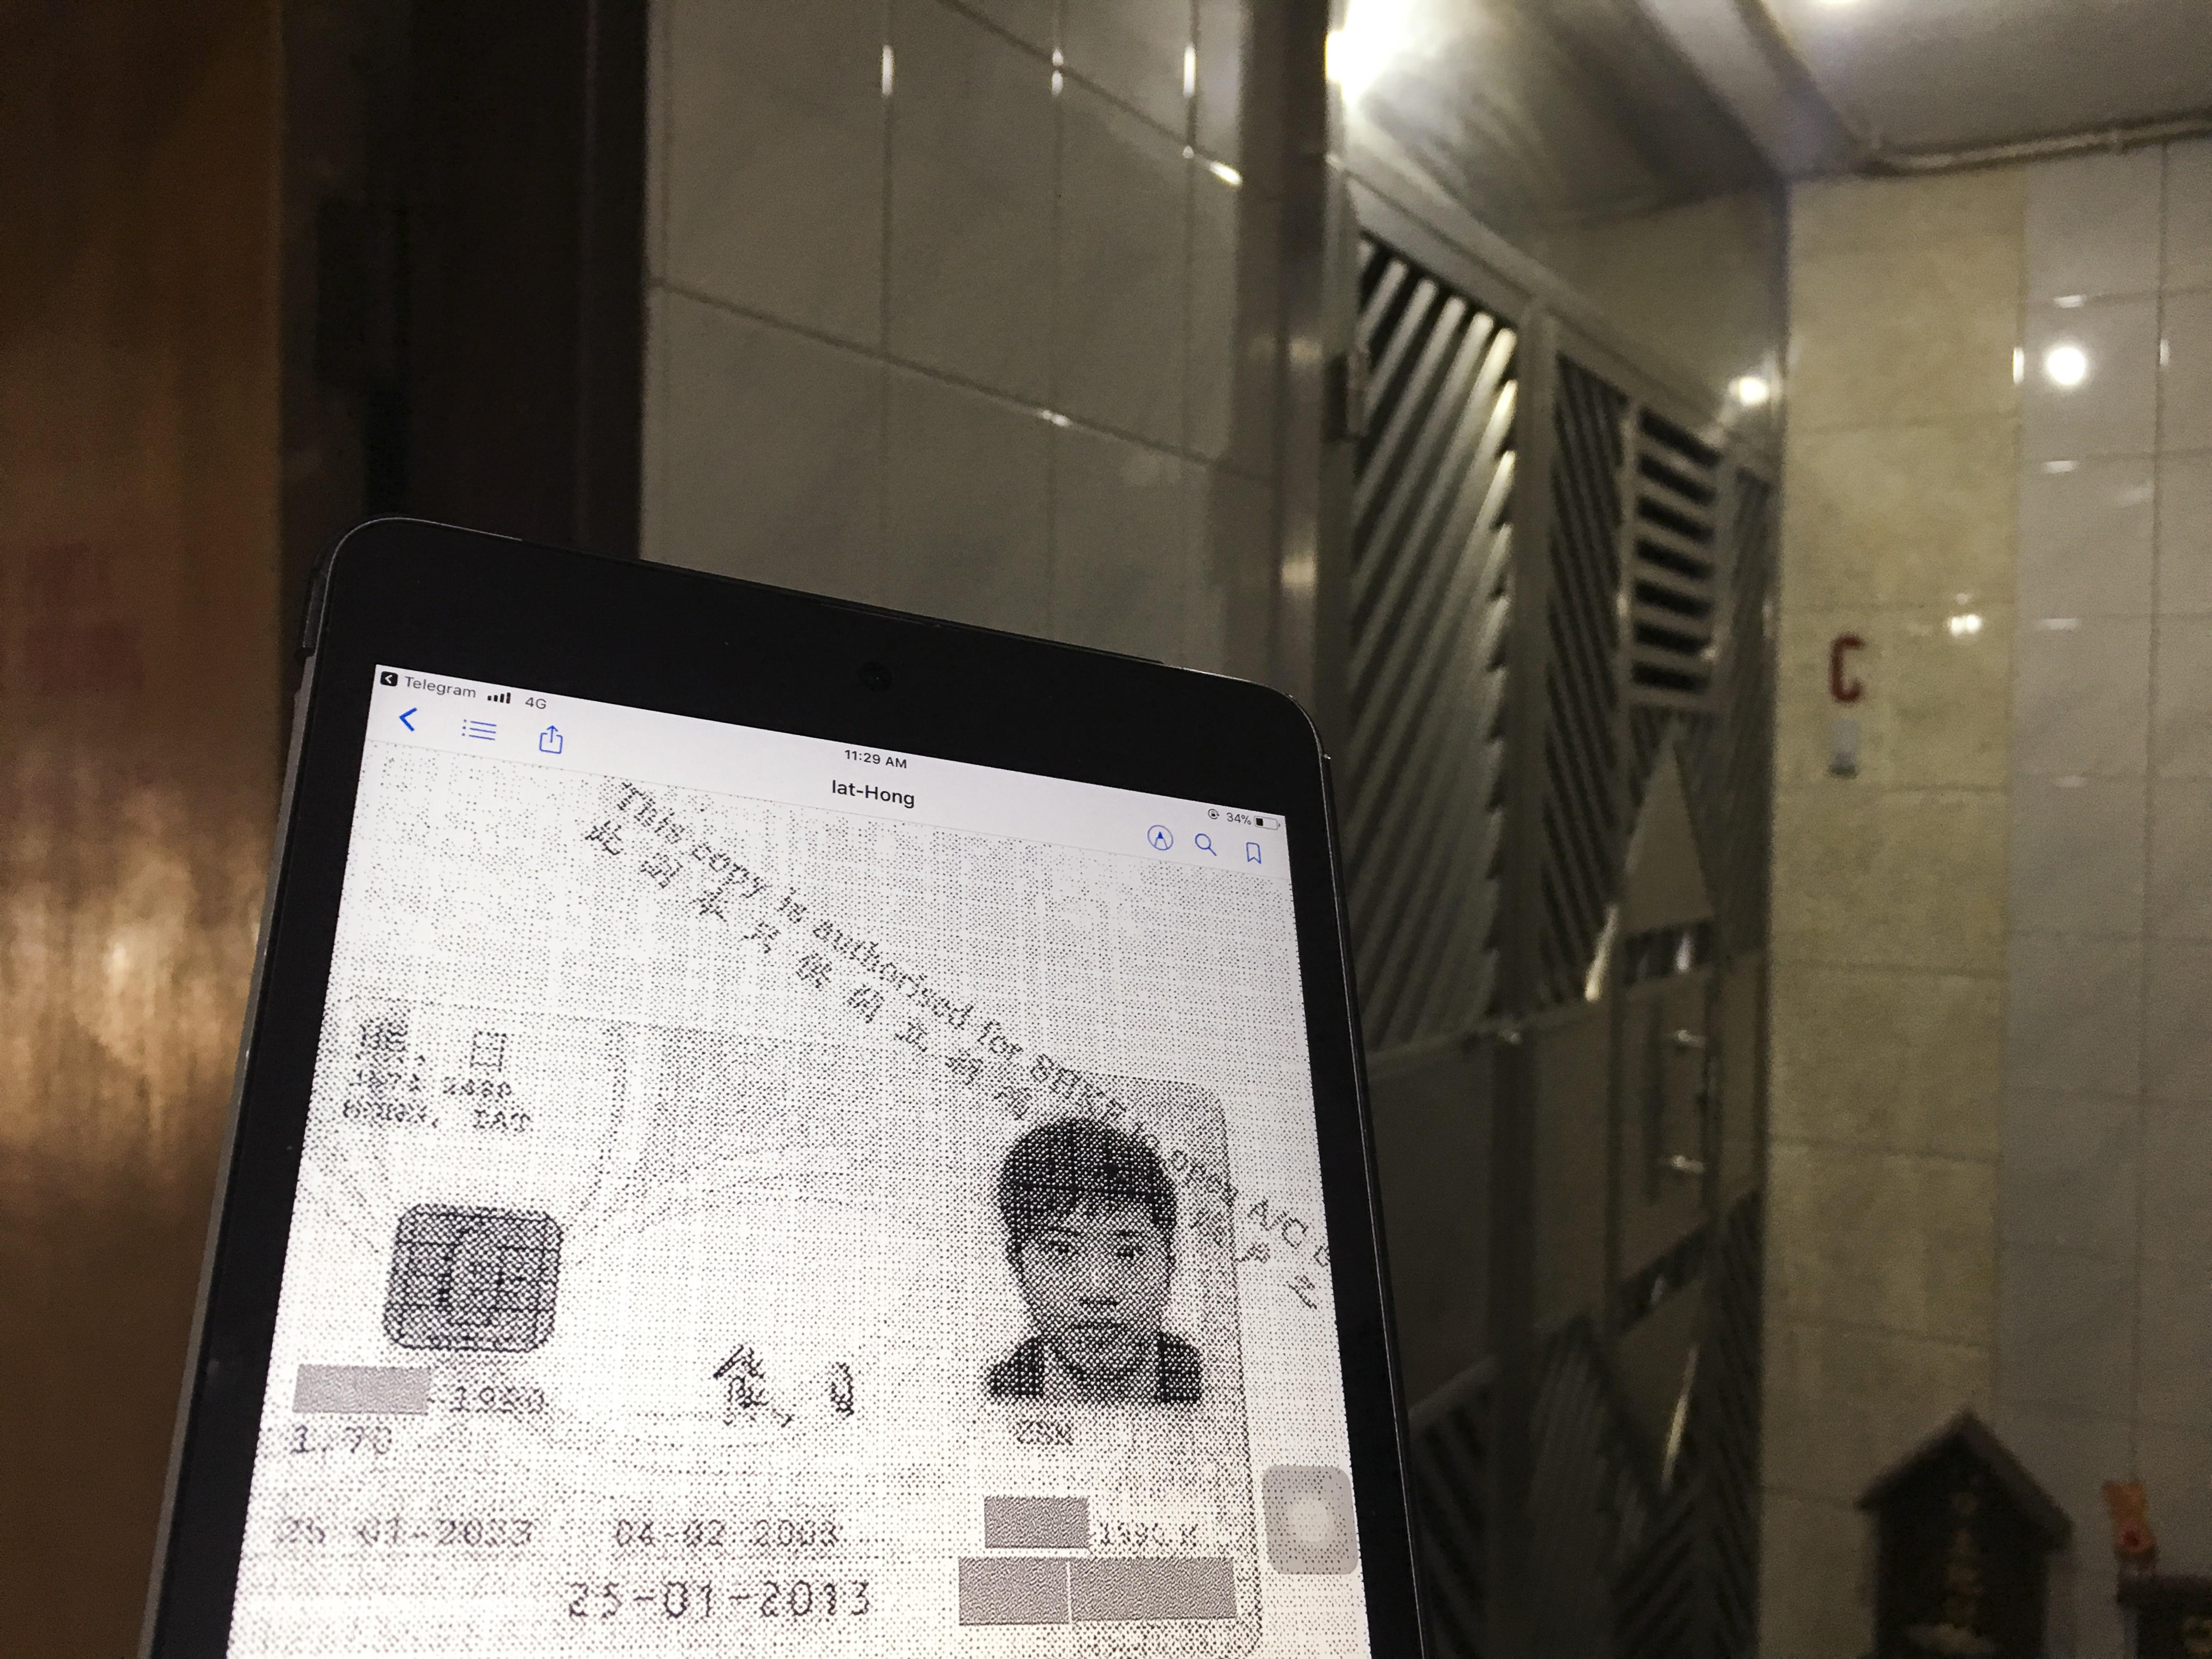 Macau hacker Hong Iat, who Hong Kong refused to hand over to